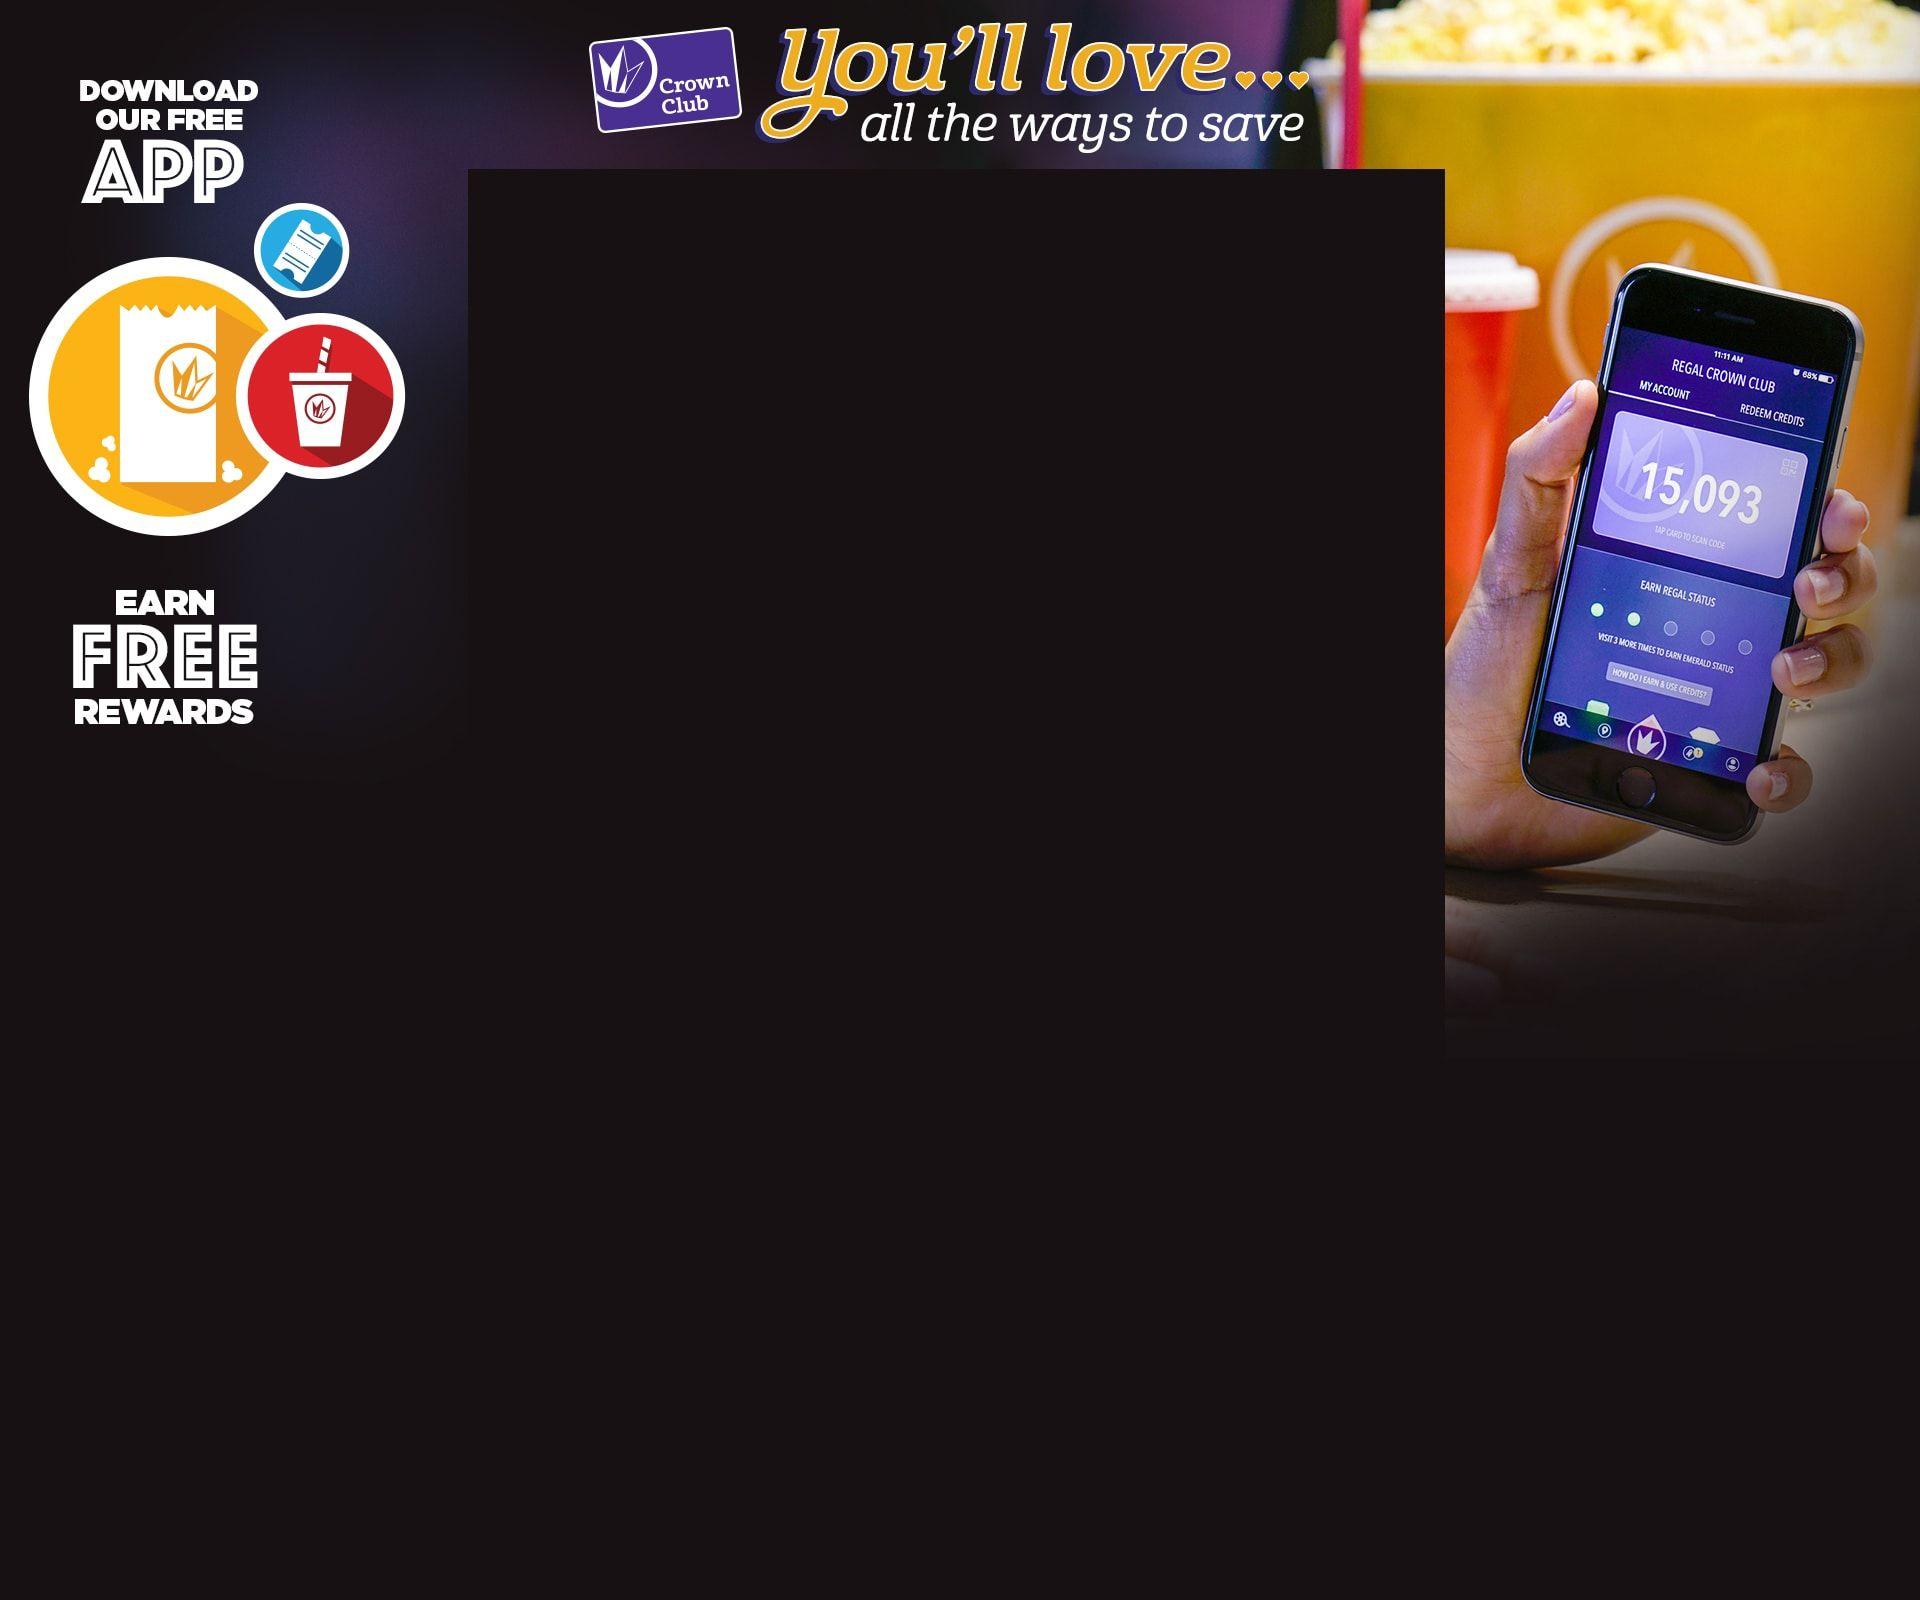 Regal Crown Club Download The Regal Movies Mobile App